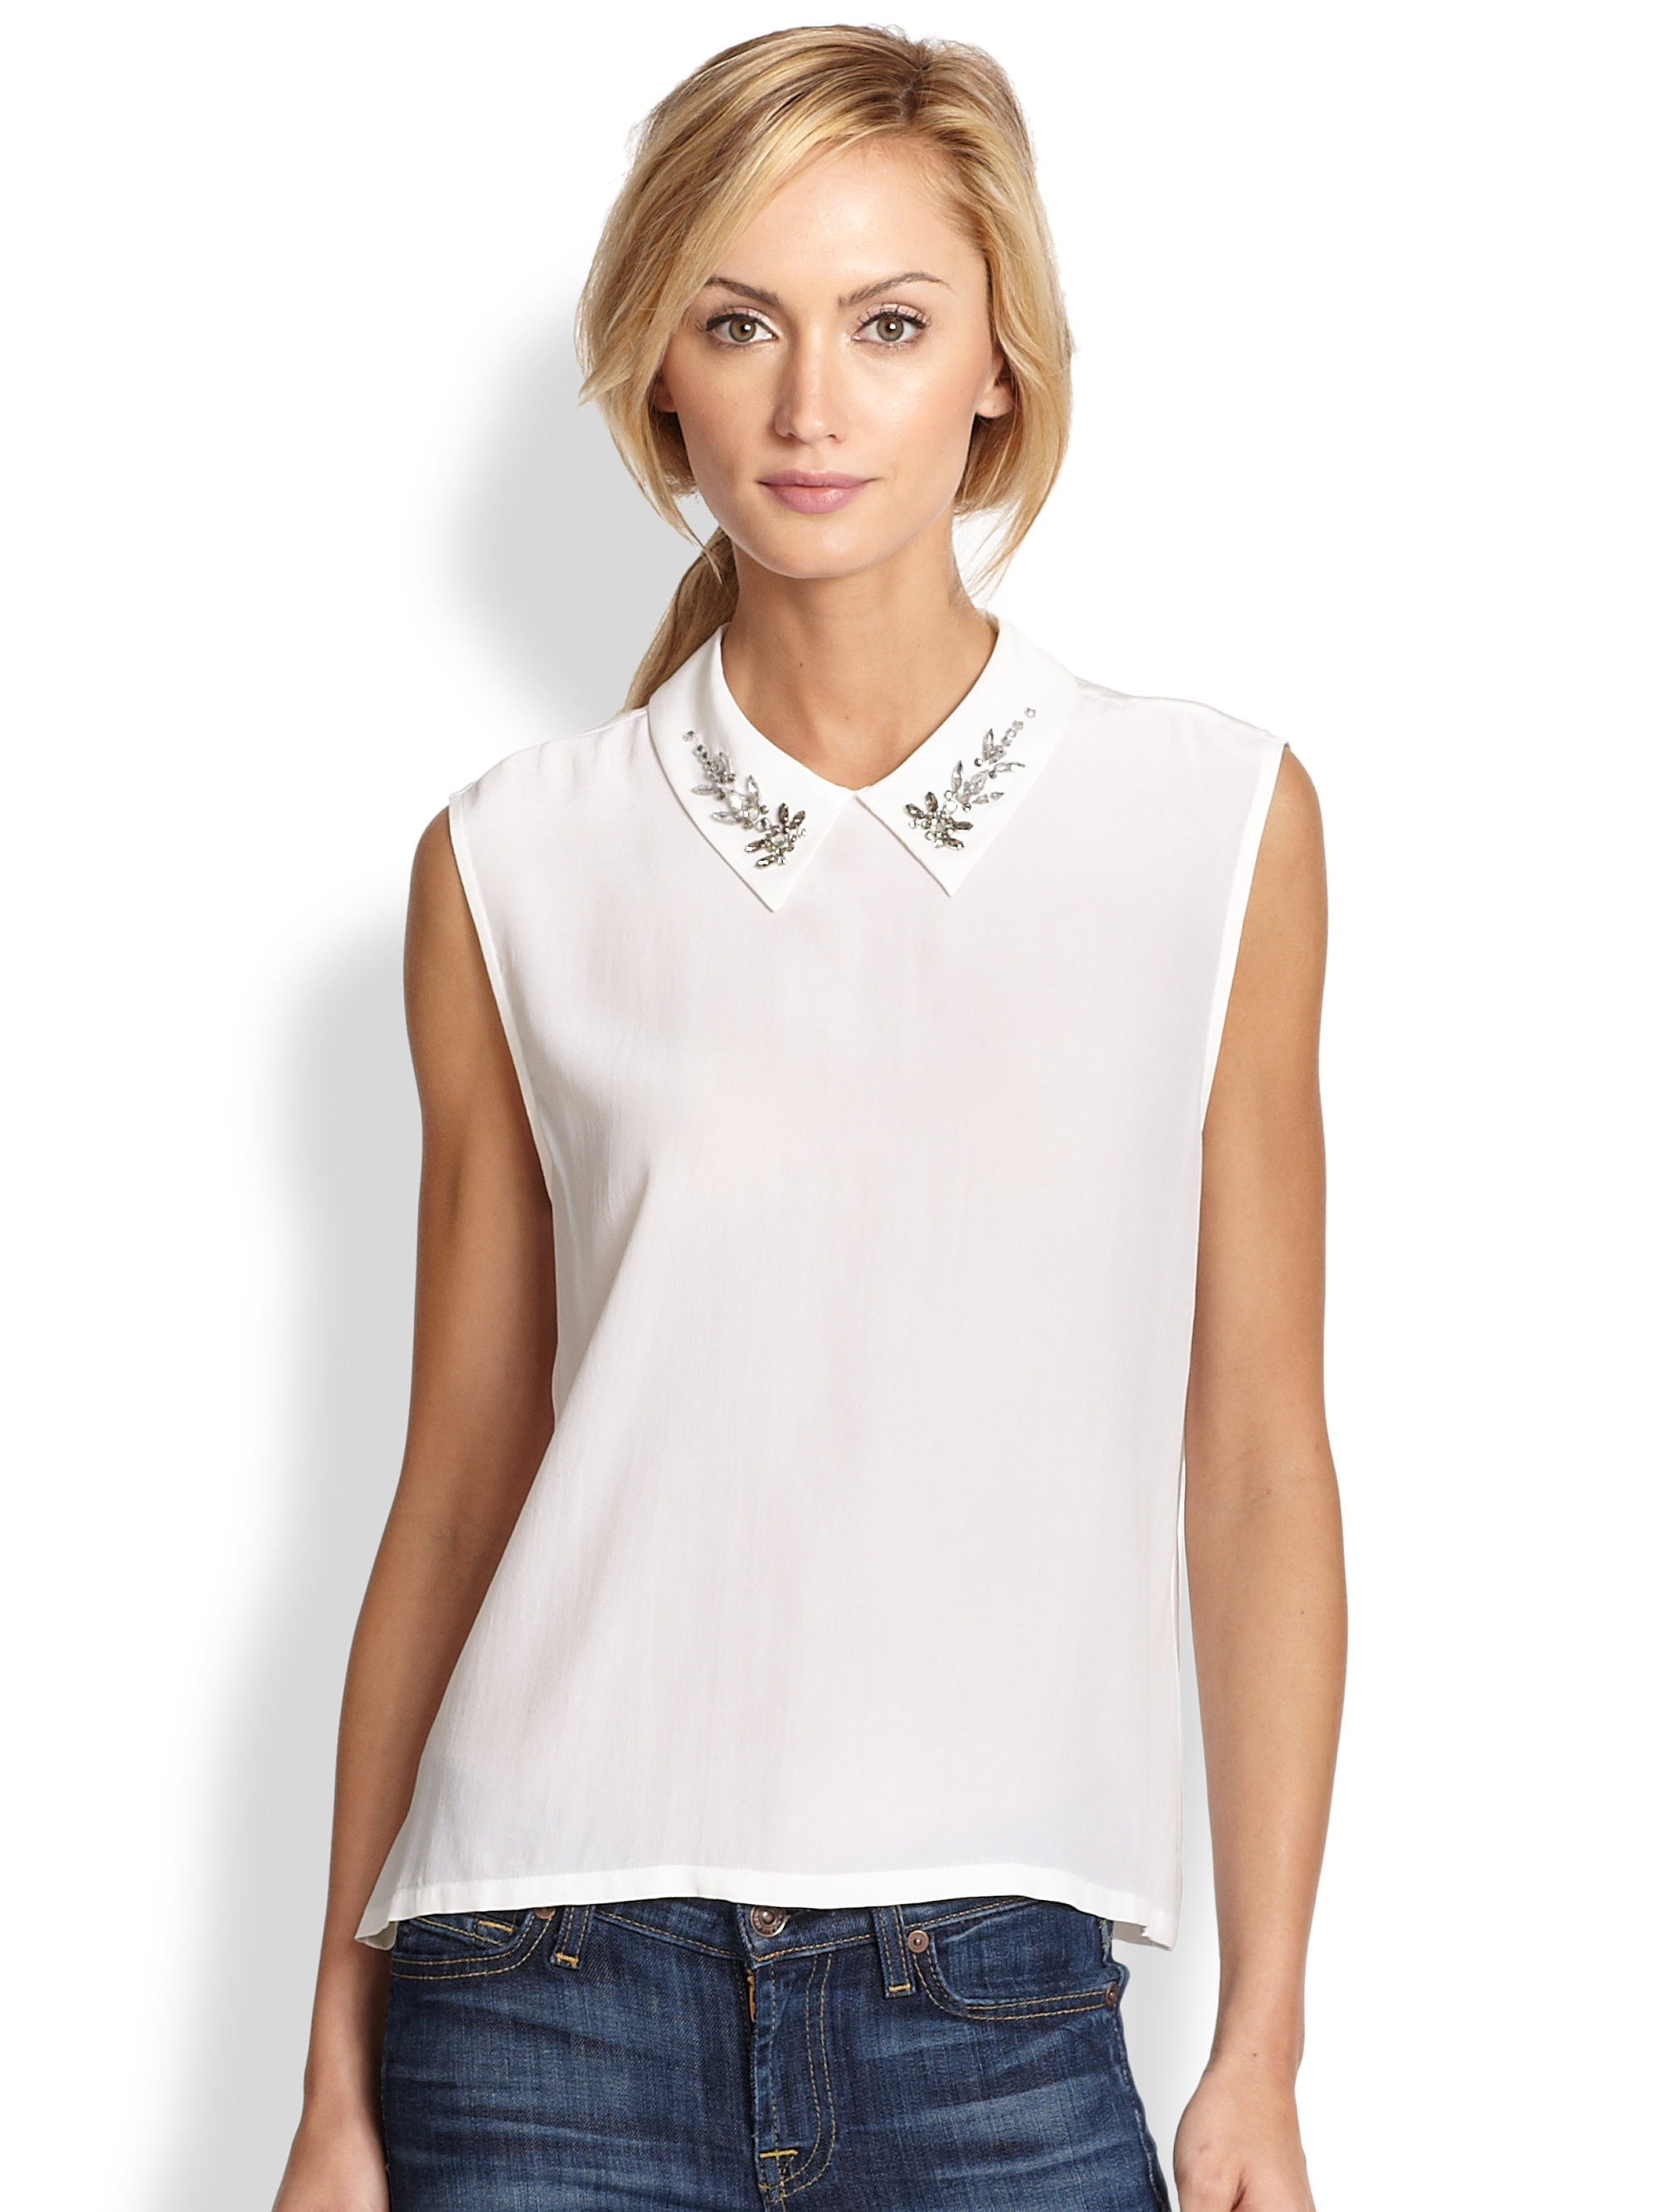 Sleeveless white silk blouse collar blouses for Sleeveless white shirt with collar